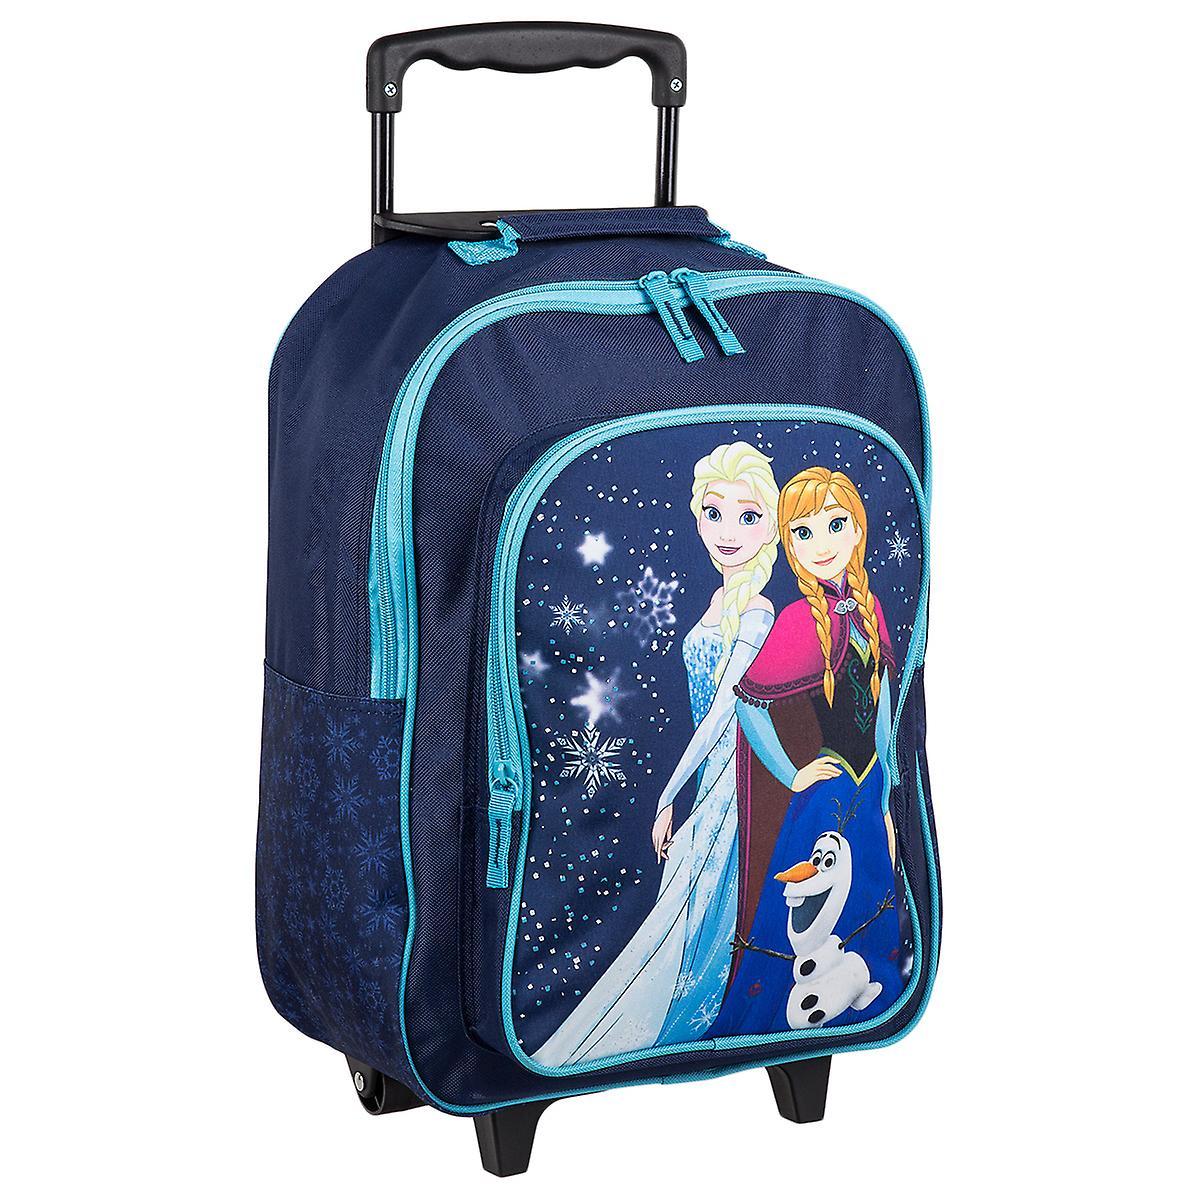 Fabrizio Disney stugor Kindertrolley barn resväska barn bagage  72a9043c09d31